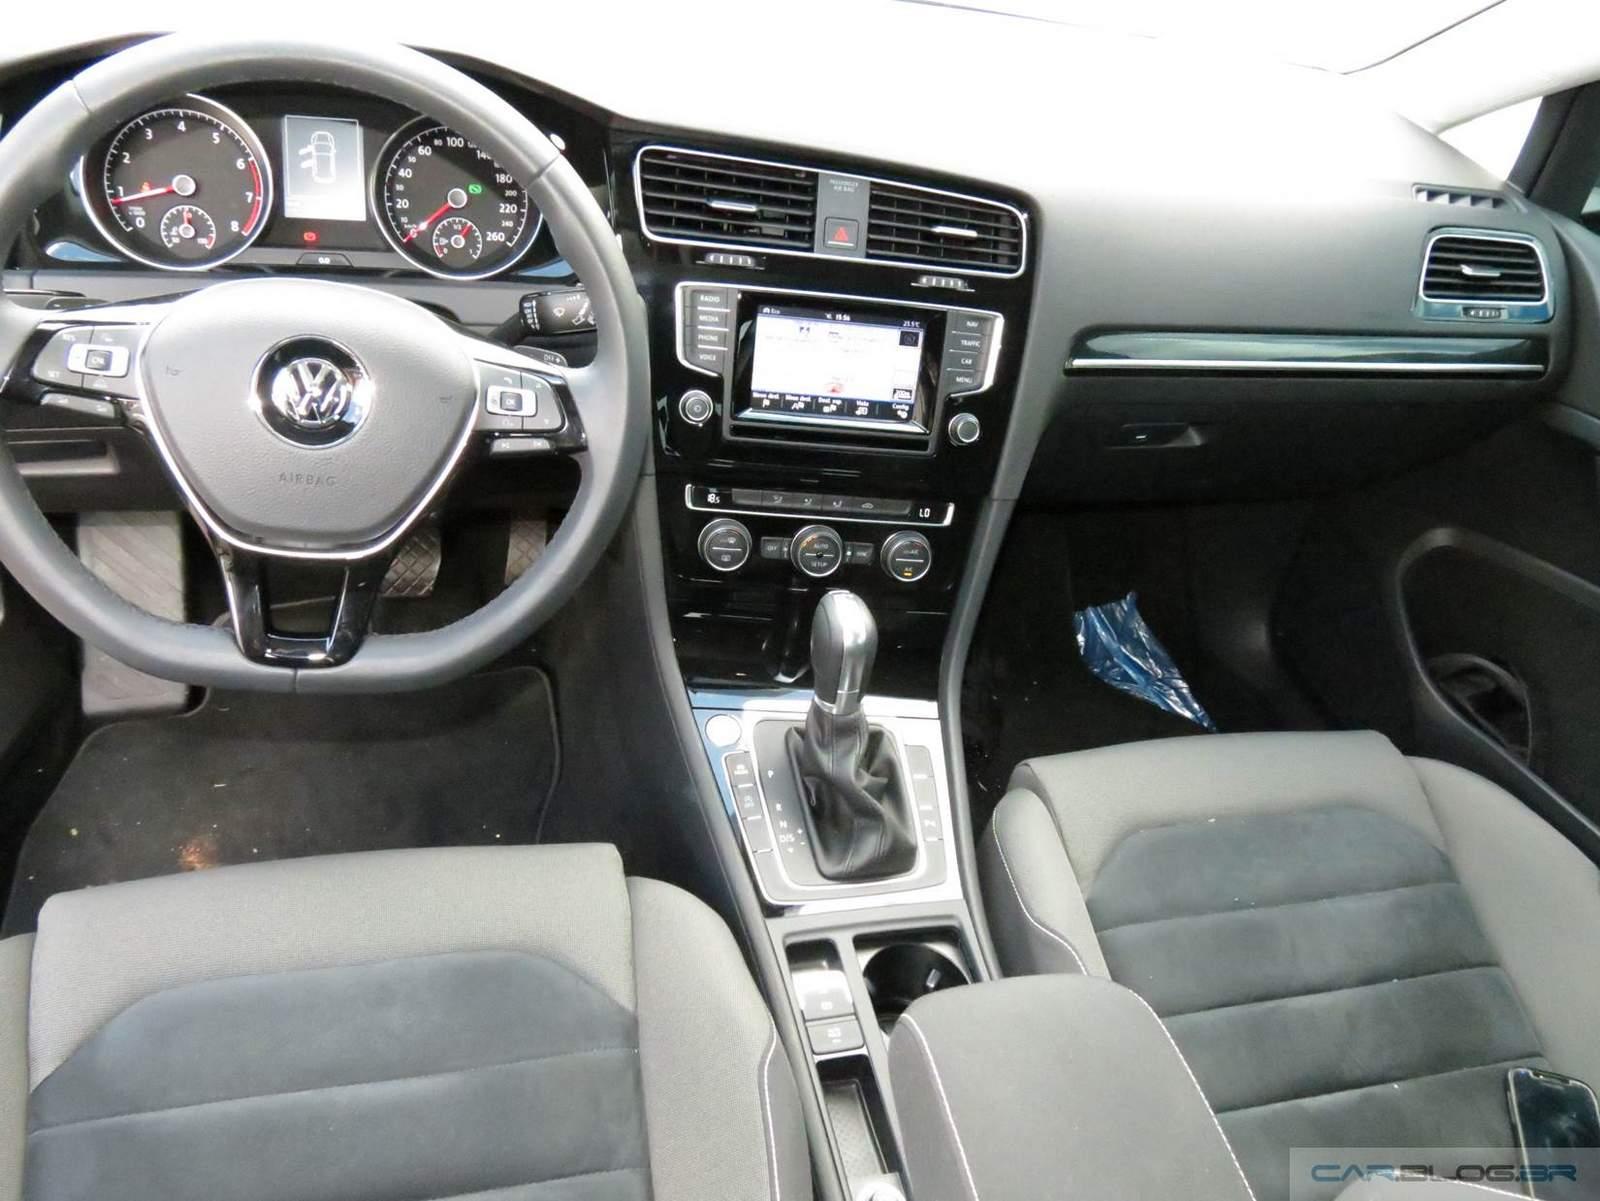 Golf TSI DSG Automático - interior - painel